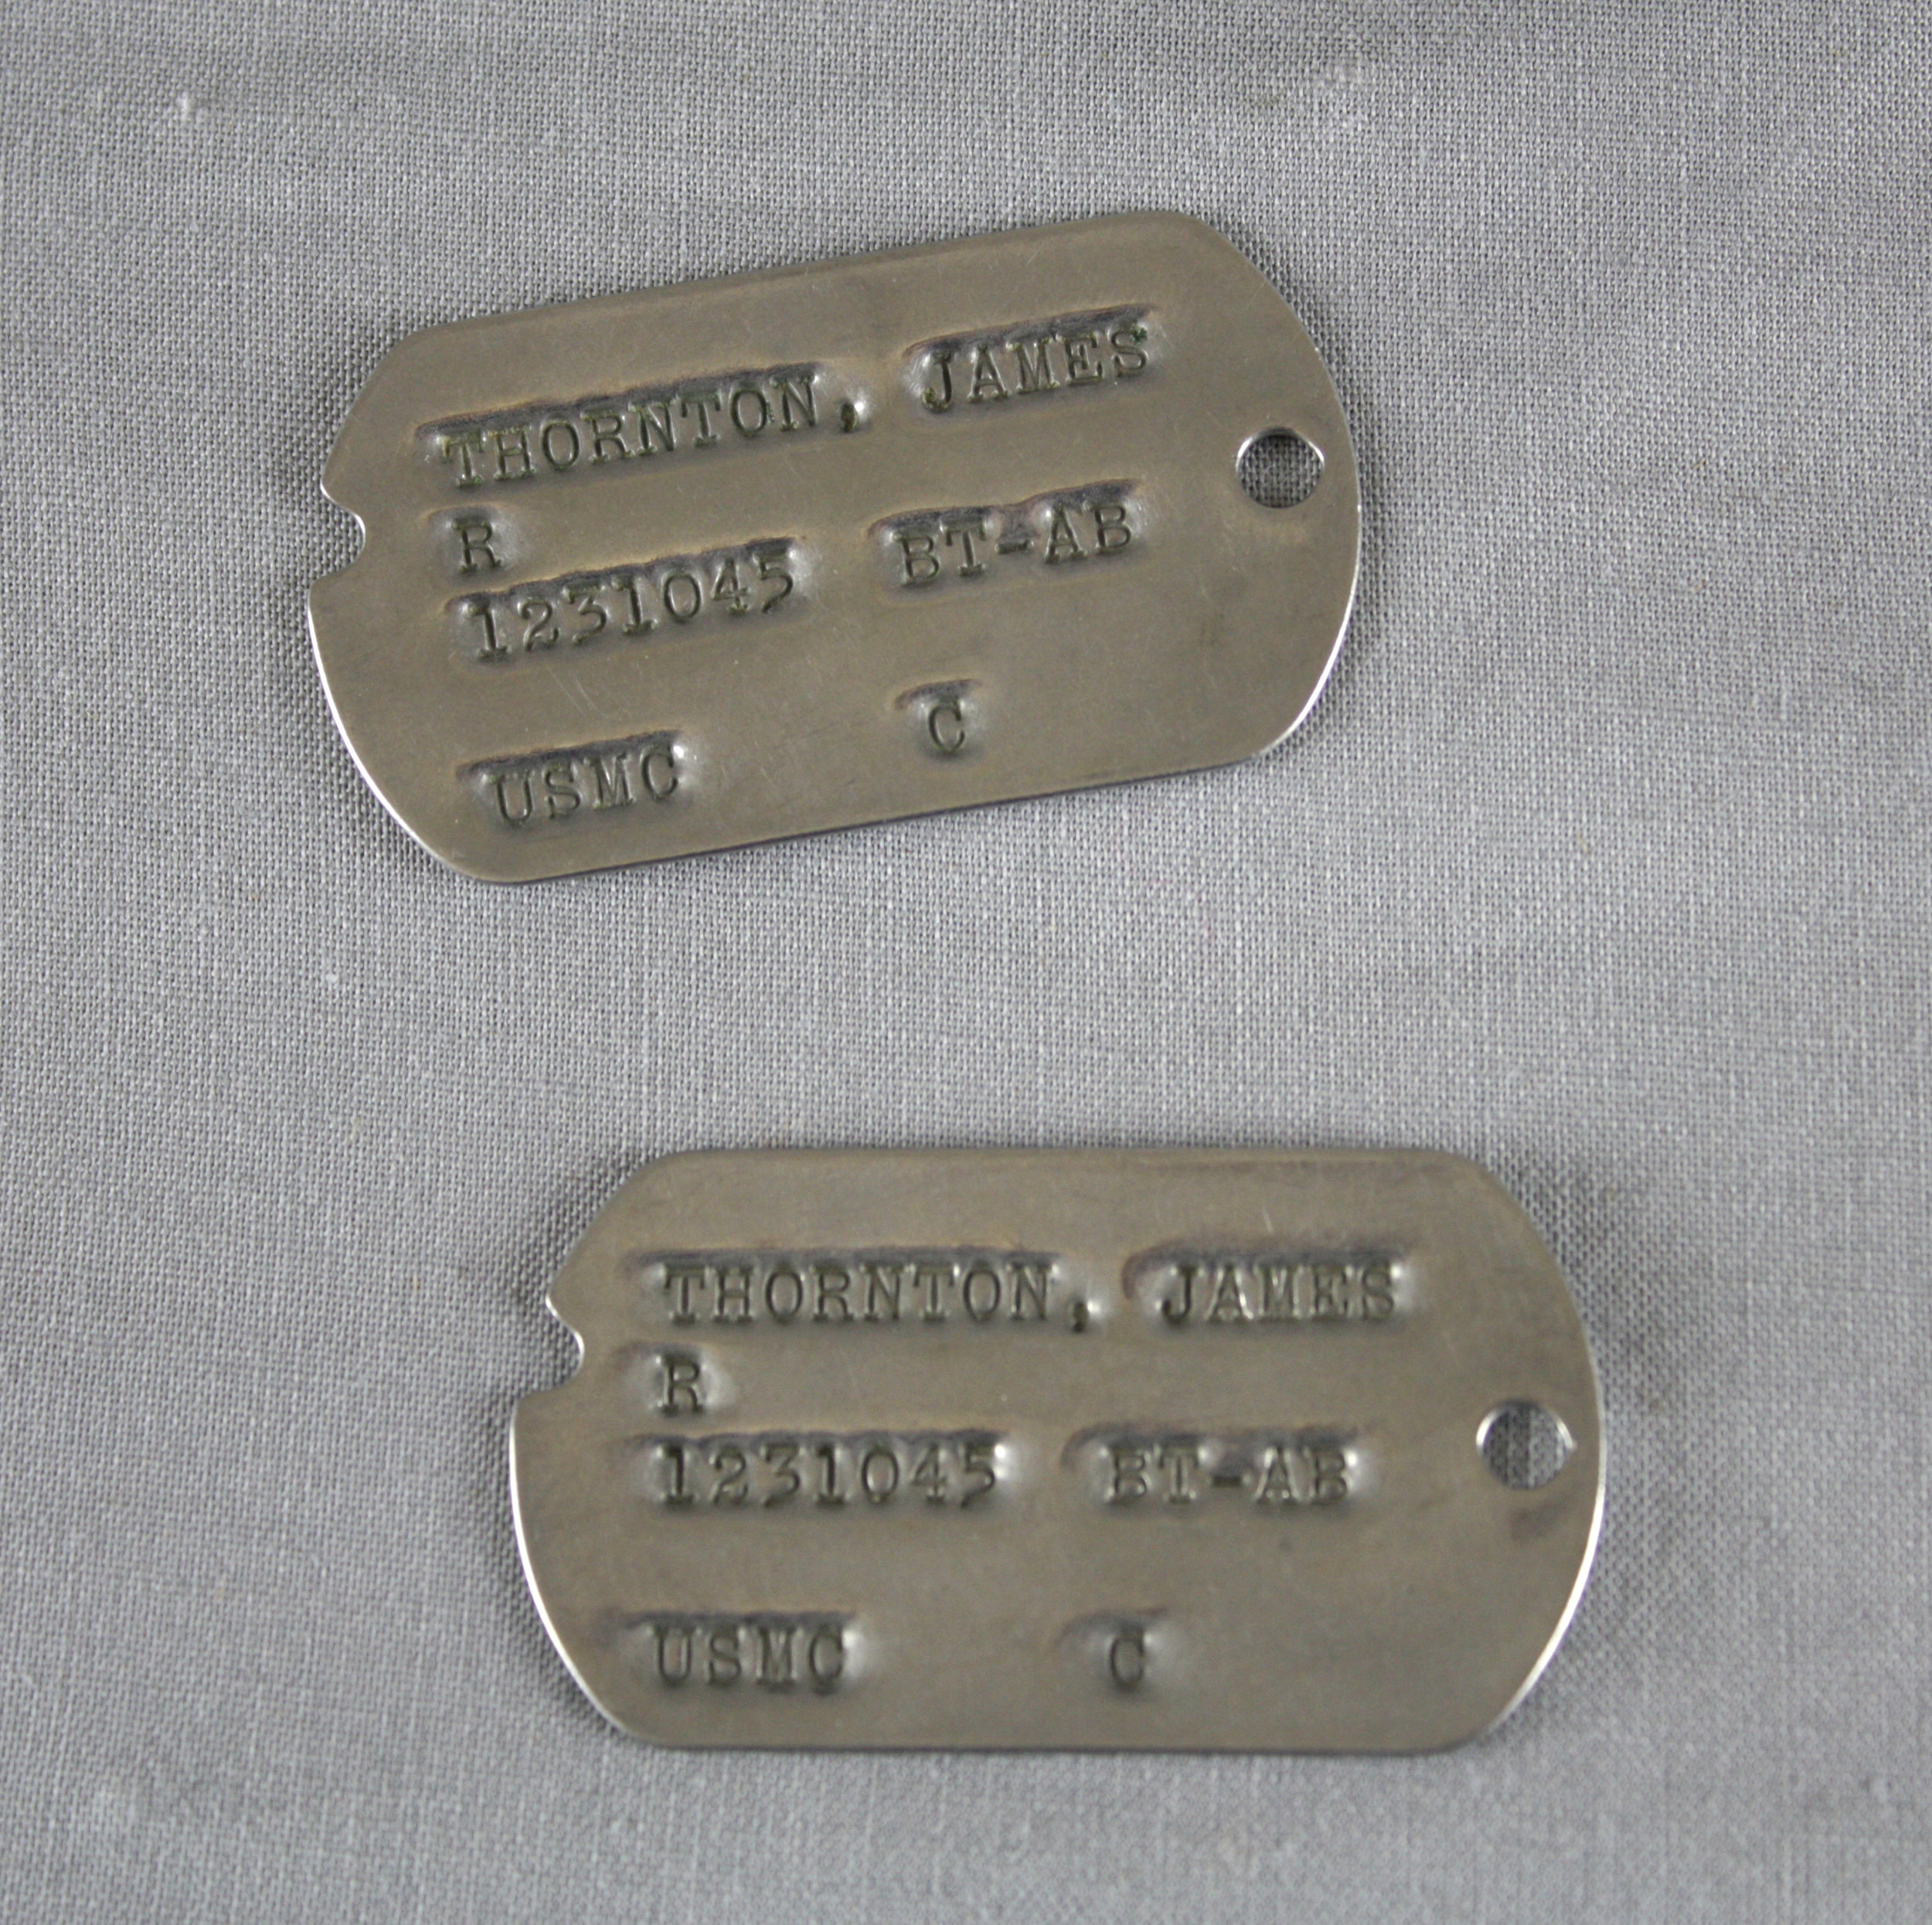 James Thornton's dog tags.